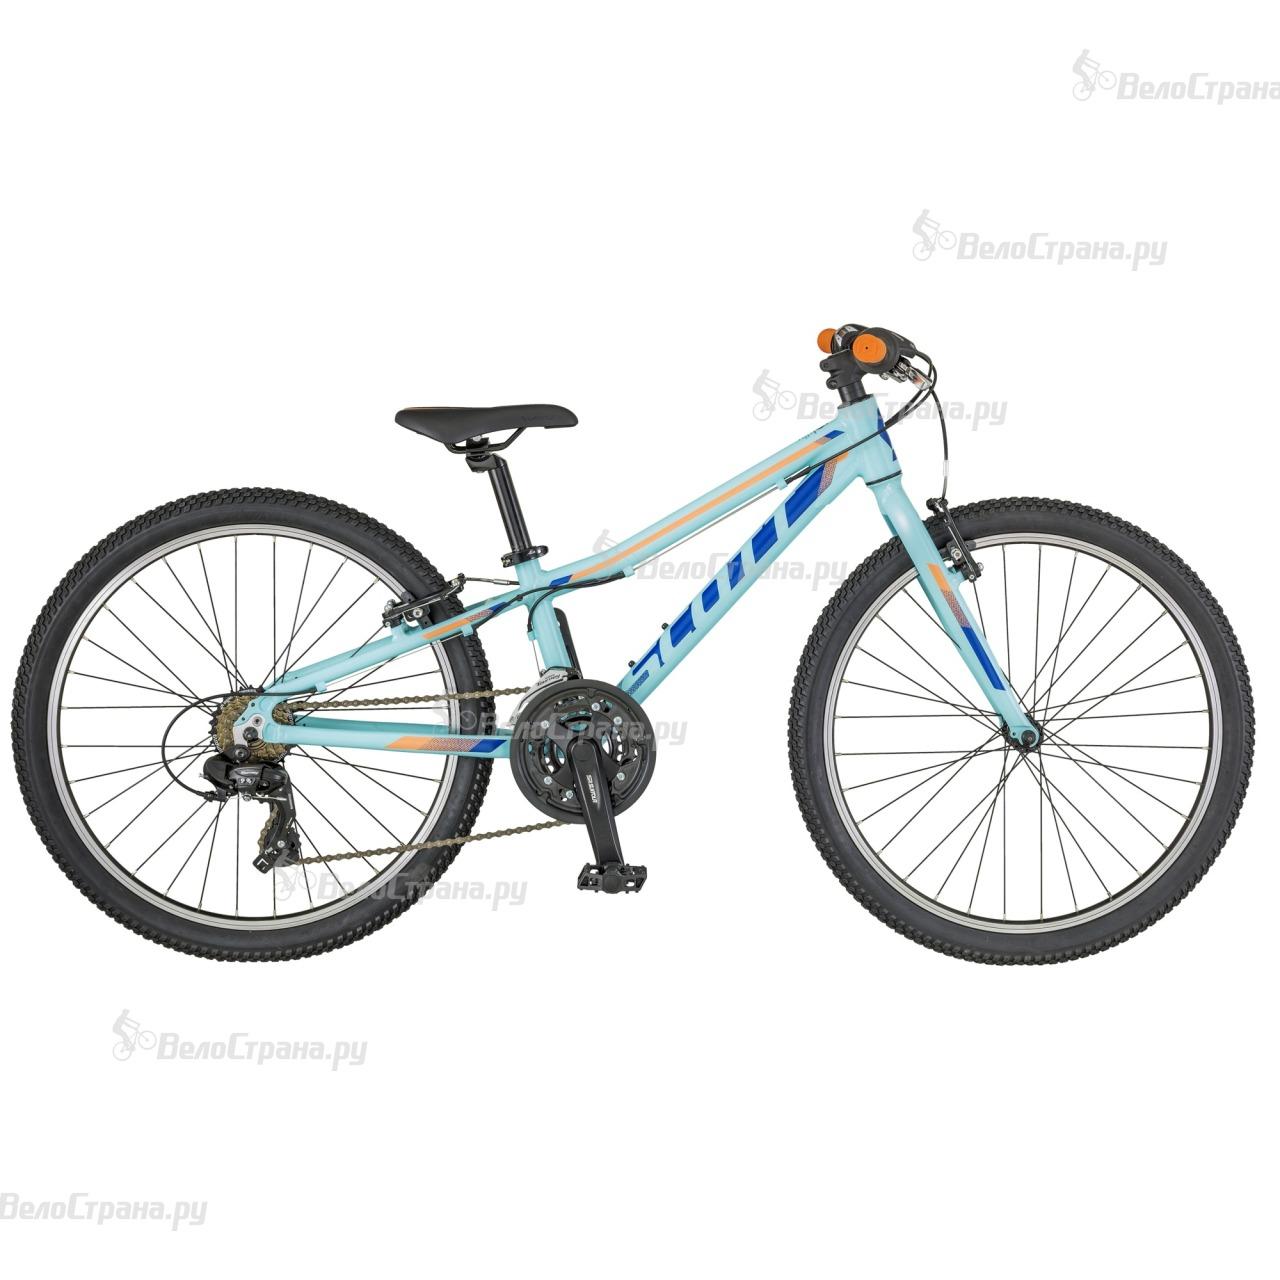 Велосипед Scott Contessa JR 24 rigid fork (2018)